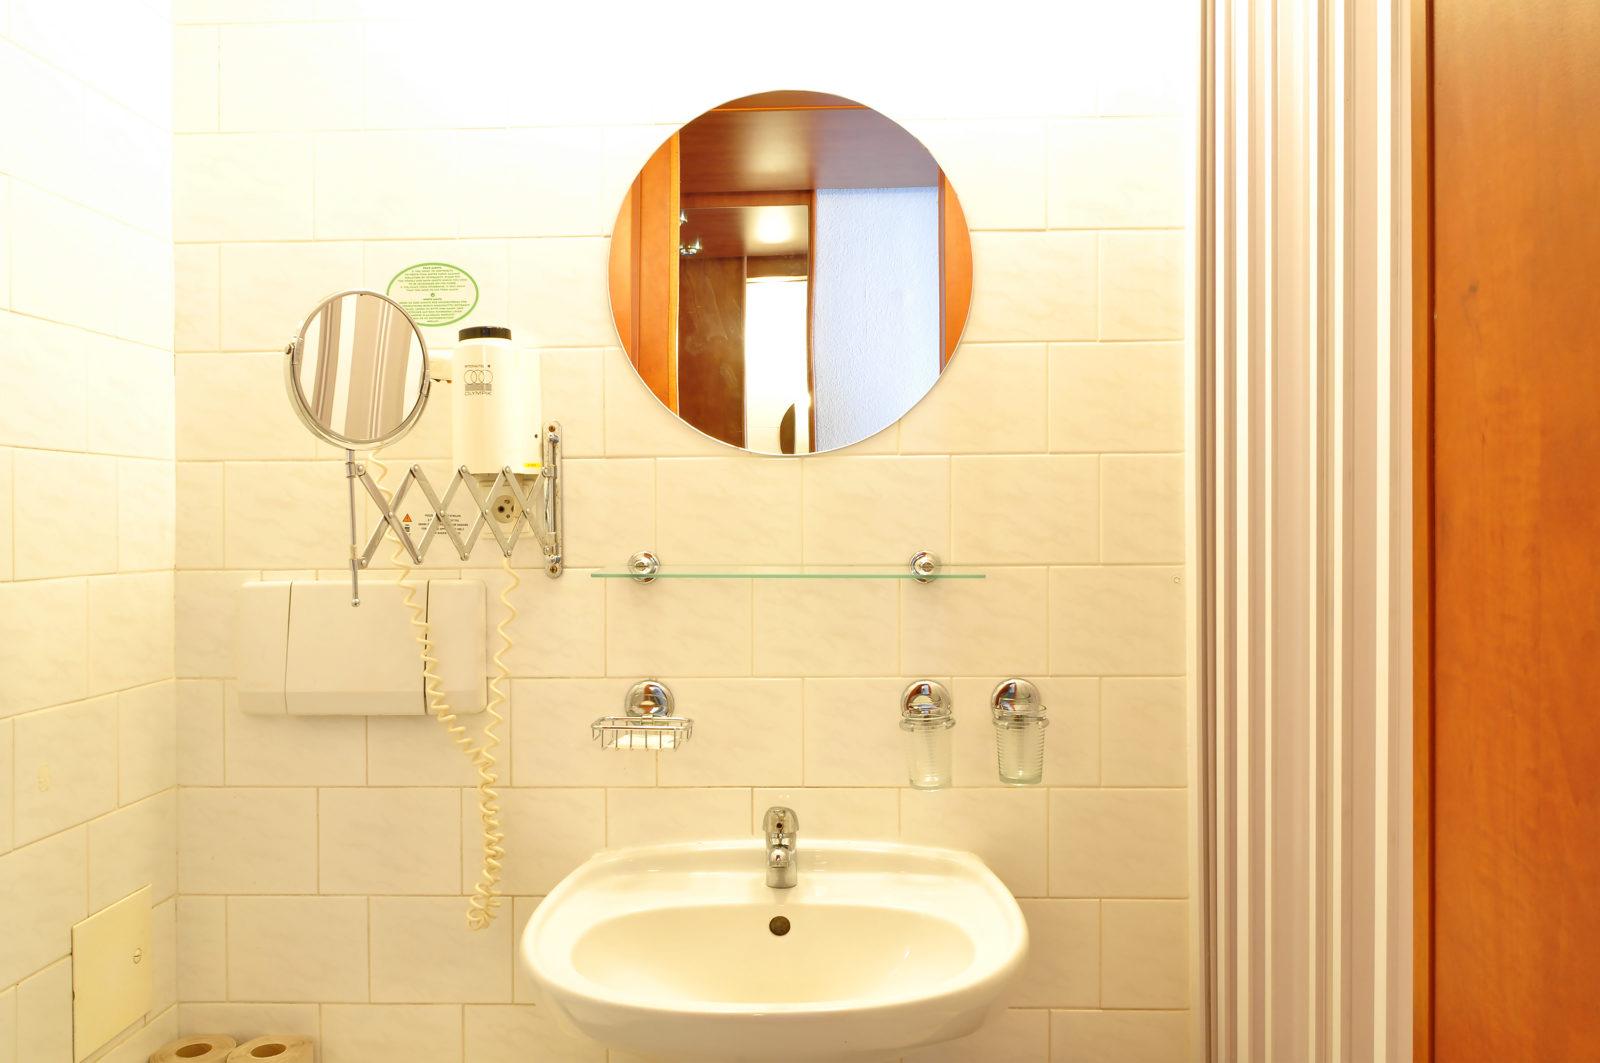 dw-tristar-rooms-max5-1600x1063